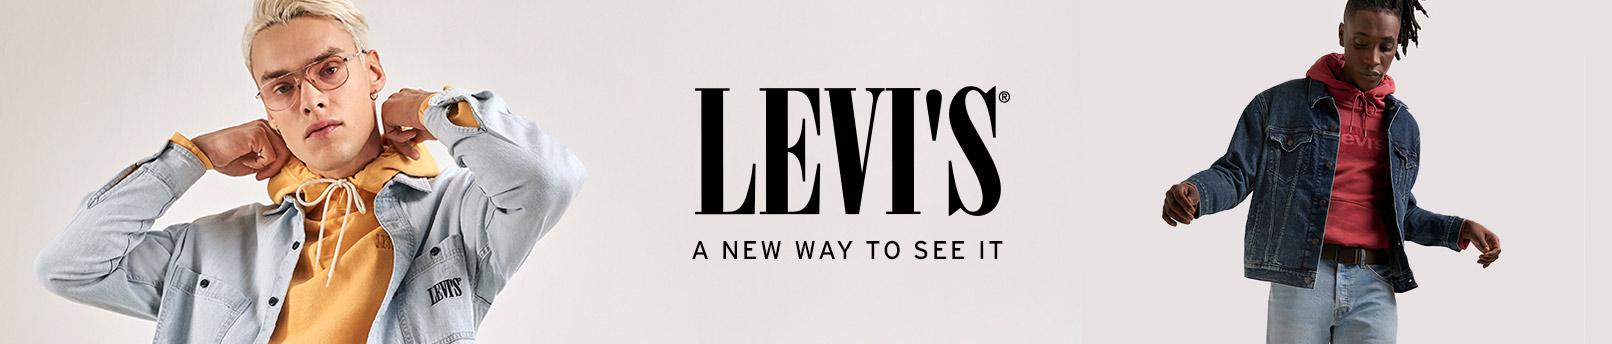 Shoppaile brändiä Levi's®